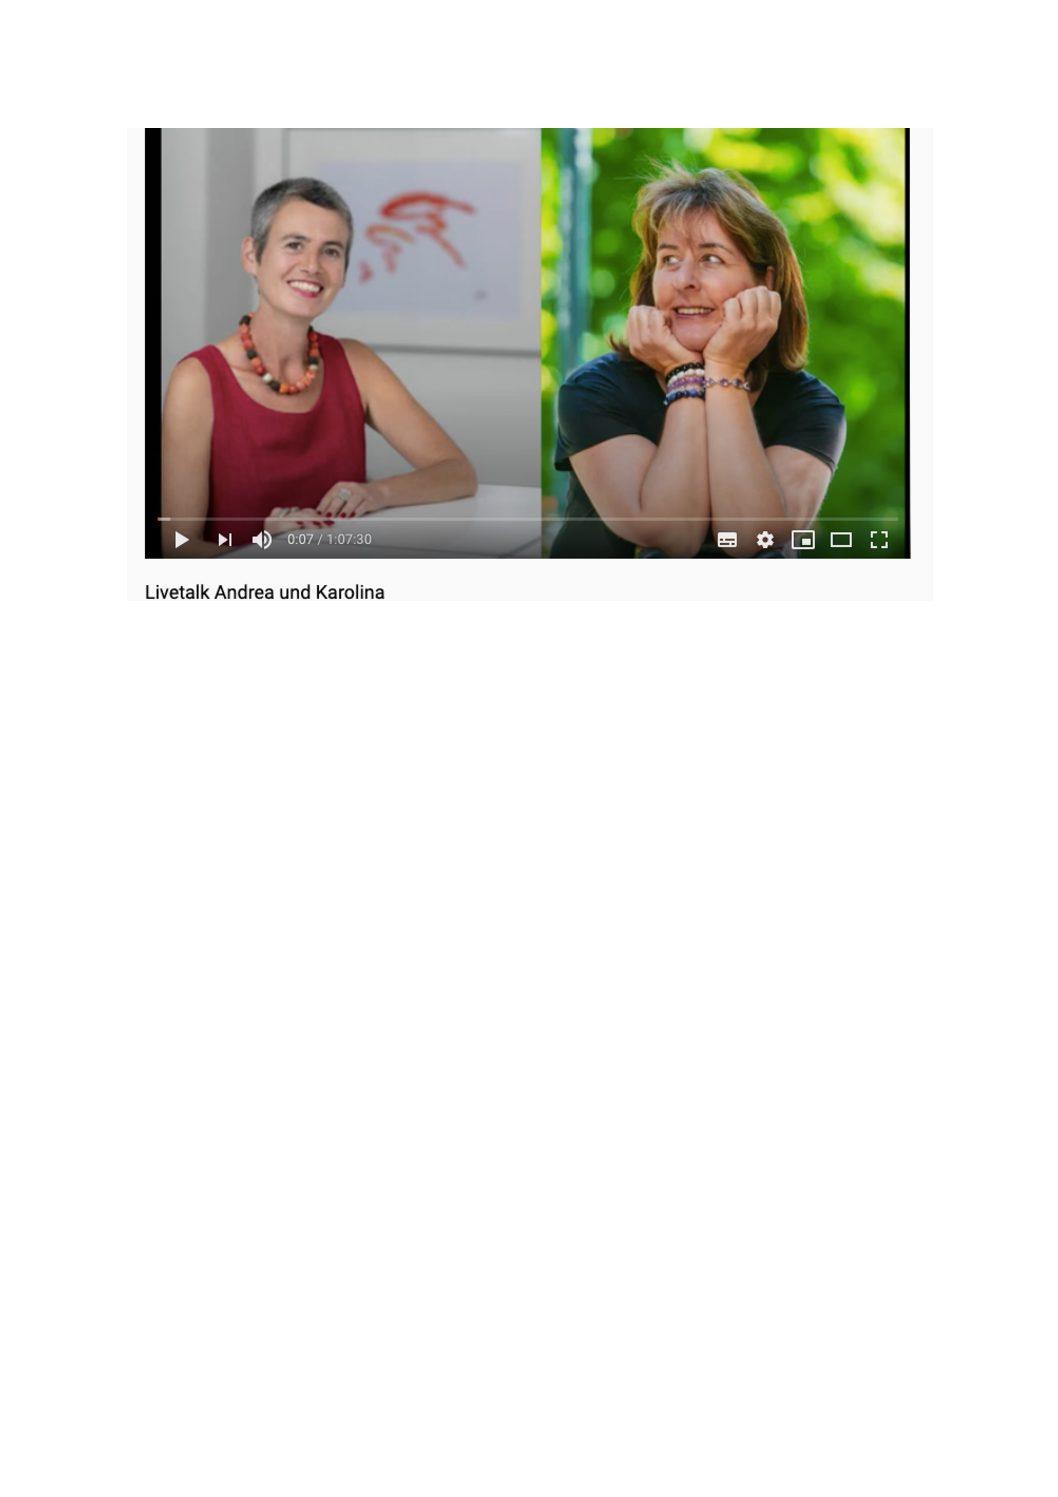 Livetalk zum Thema Disziplin mit Andrea und Karolina Samstag 25.4.2020 20.00 Uhr